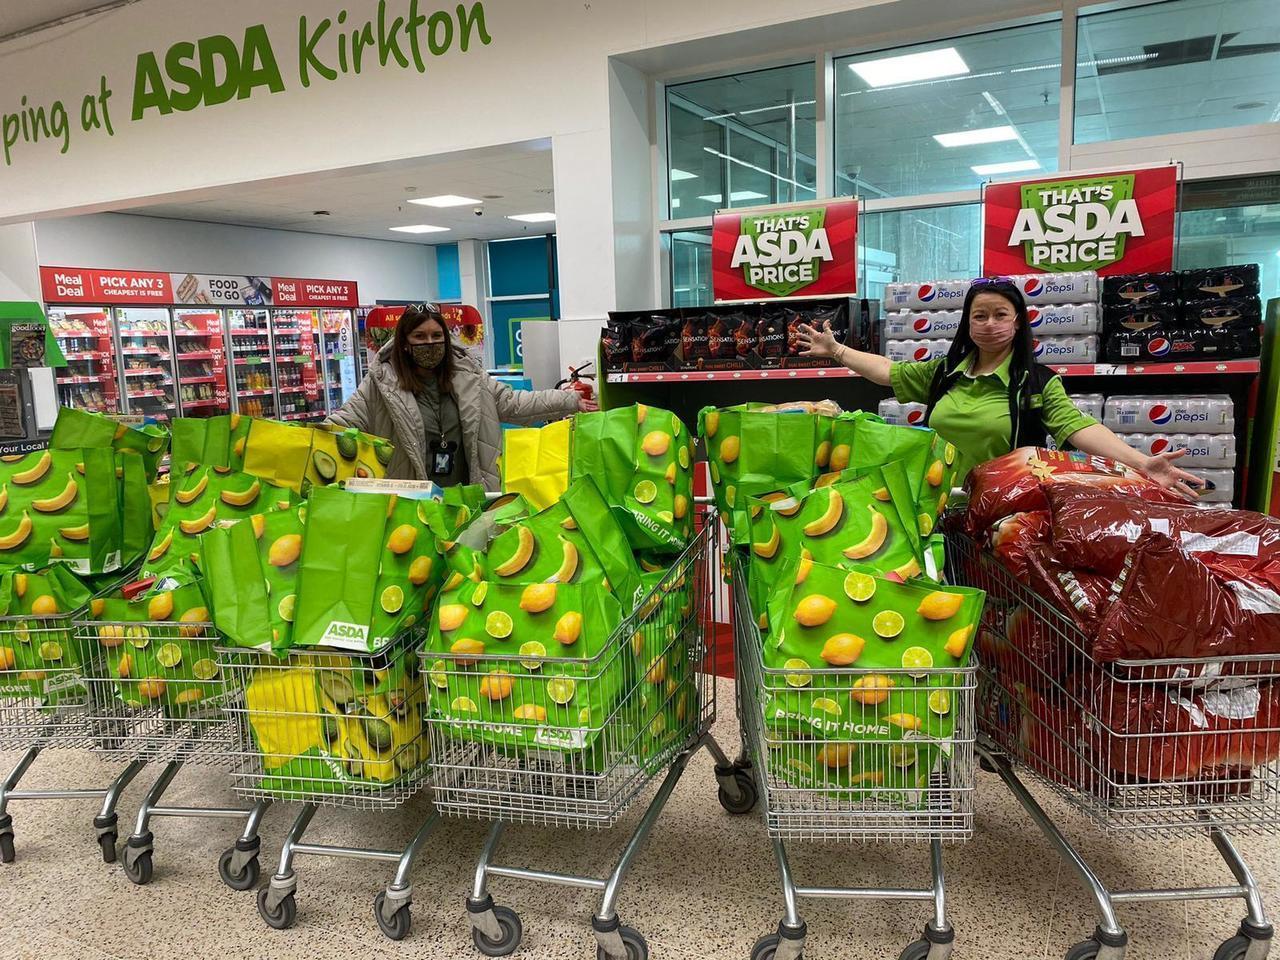 £600 grant to nursery | Asda Dundee Kirkton